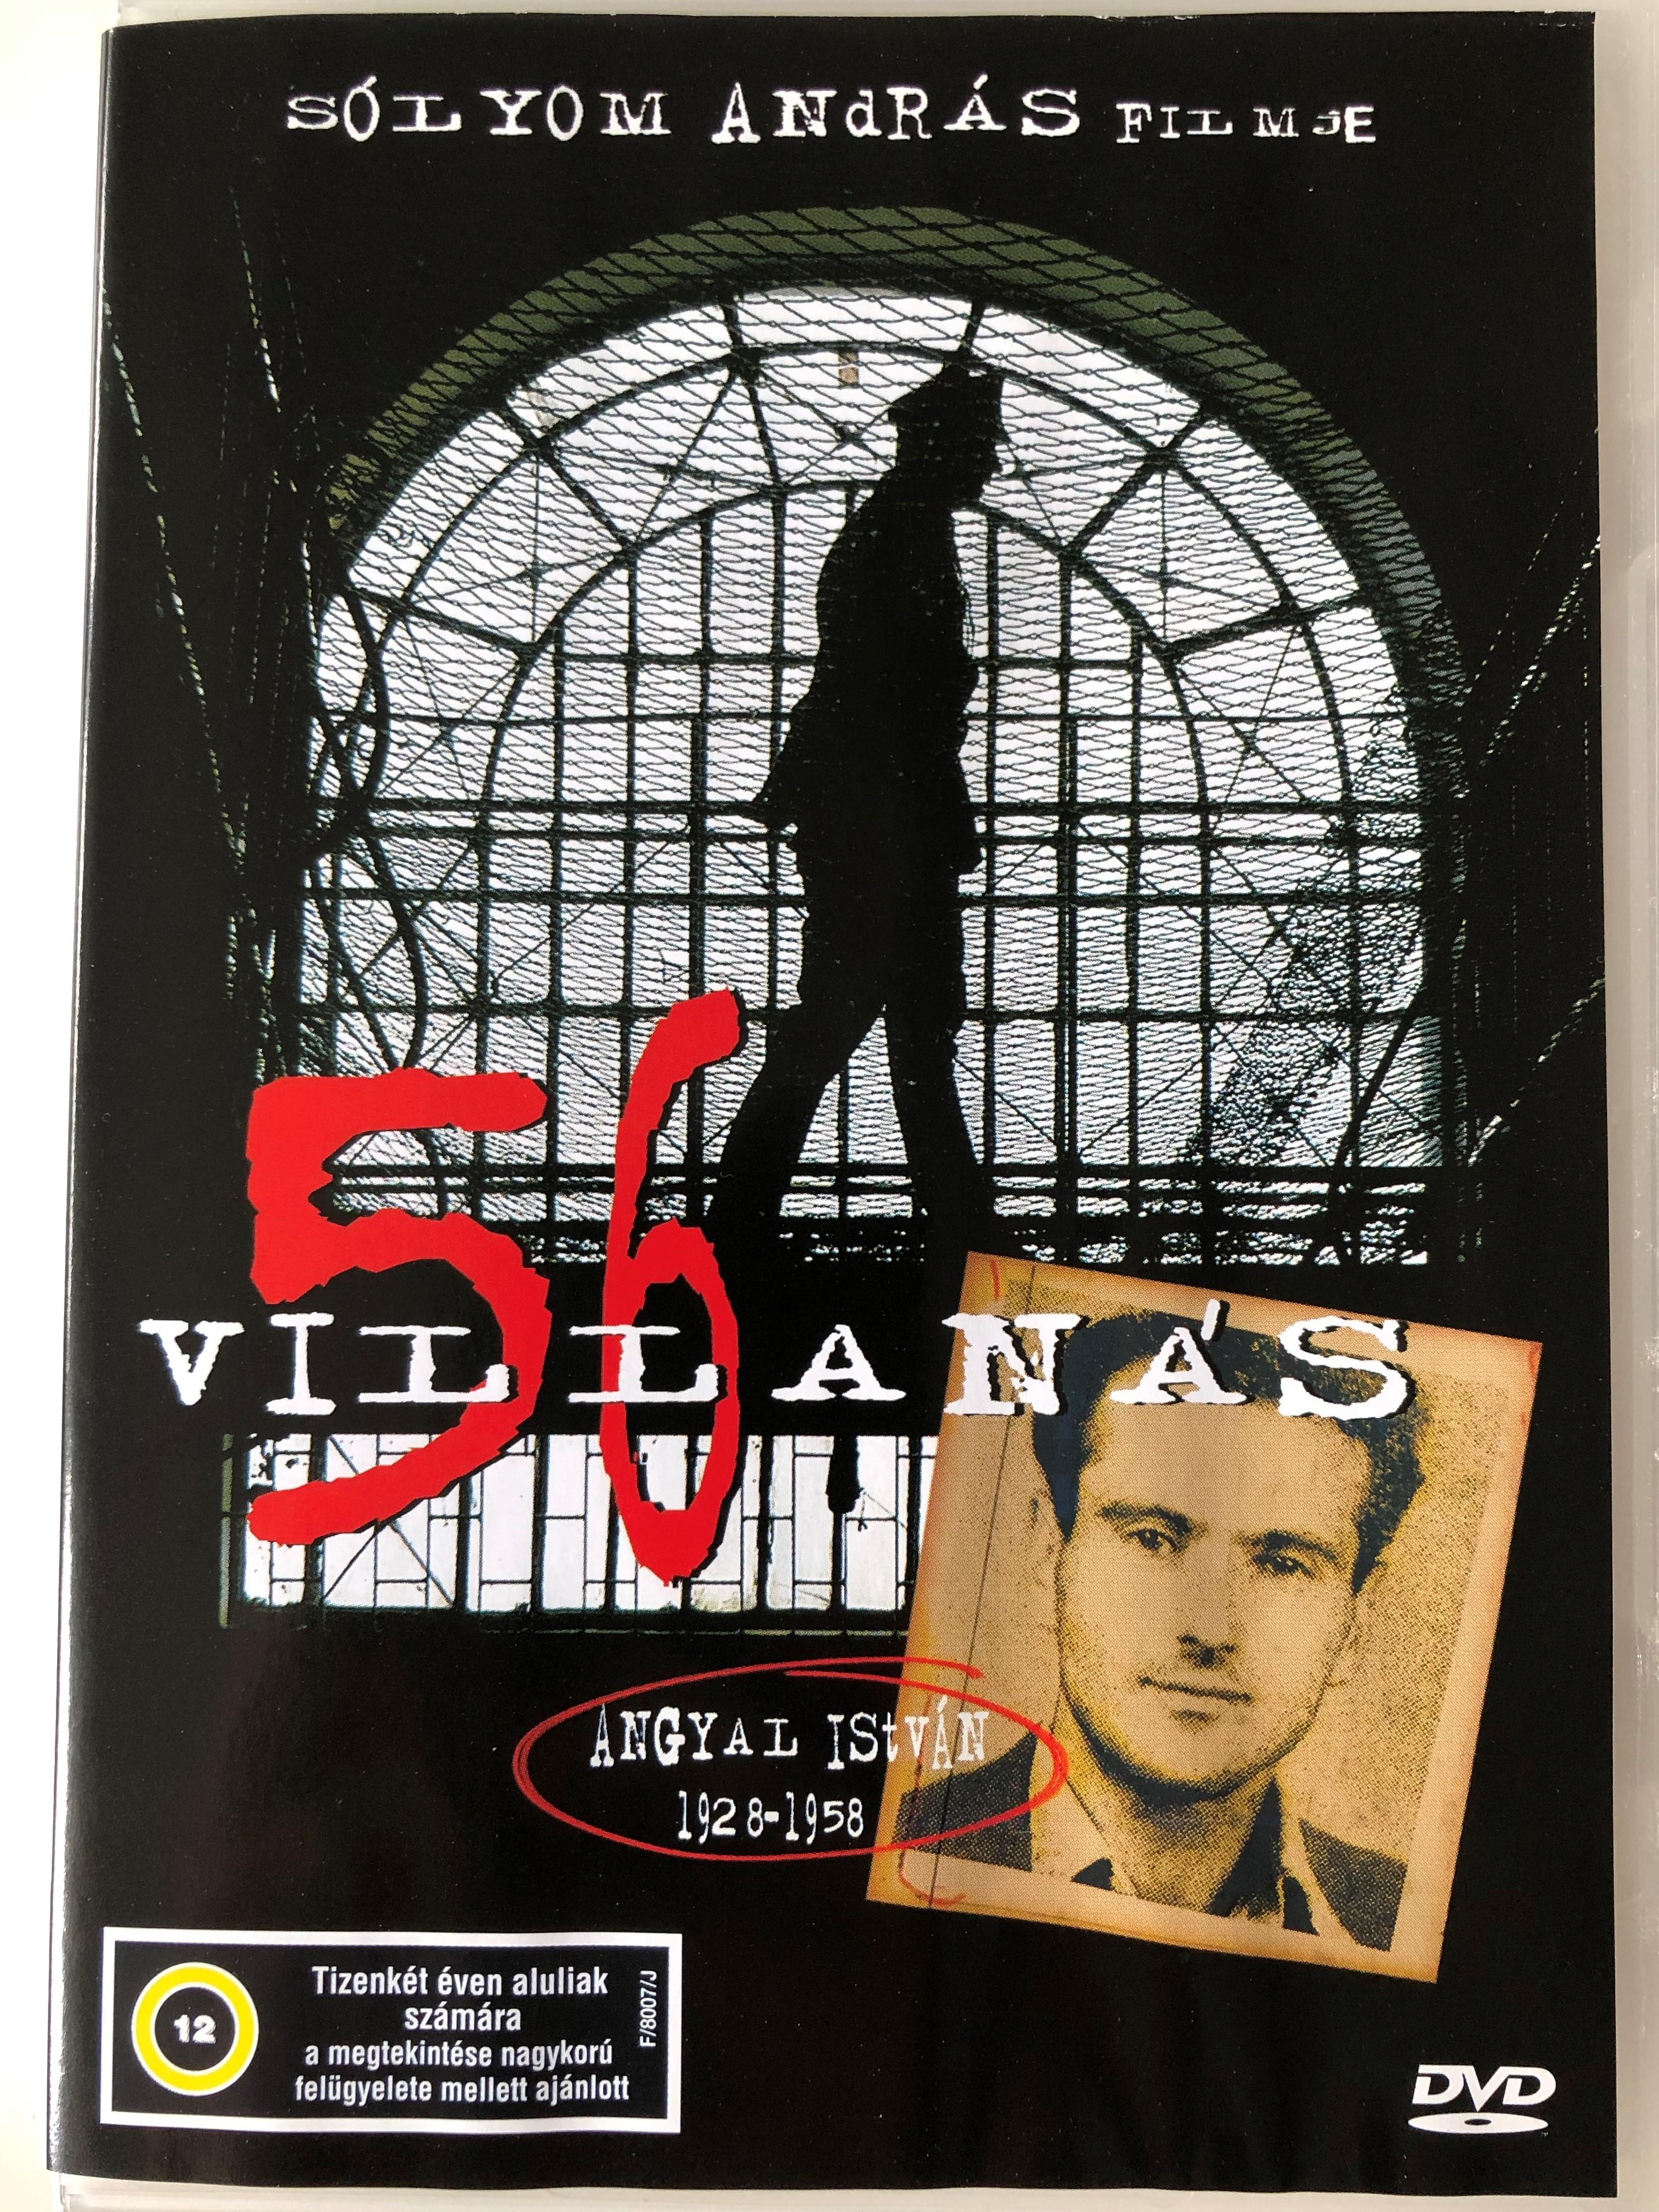 56-villan-s-dvd-2007-56-flashes-angyal-istv-n-1928-1958-1.jpg